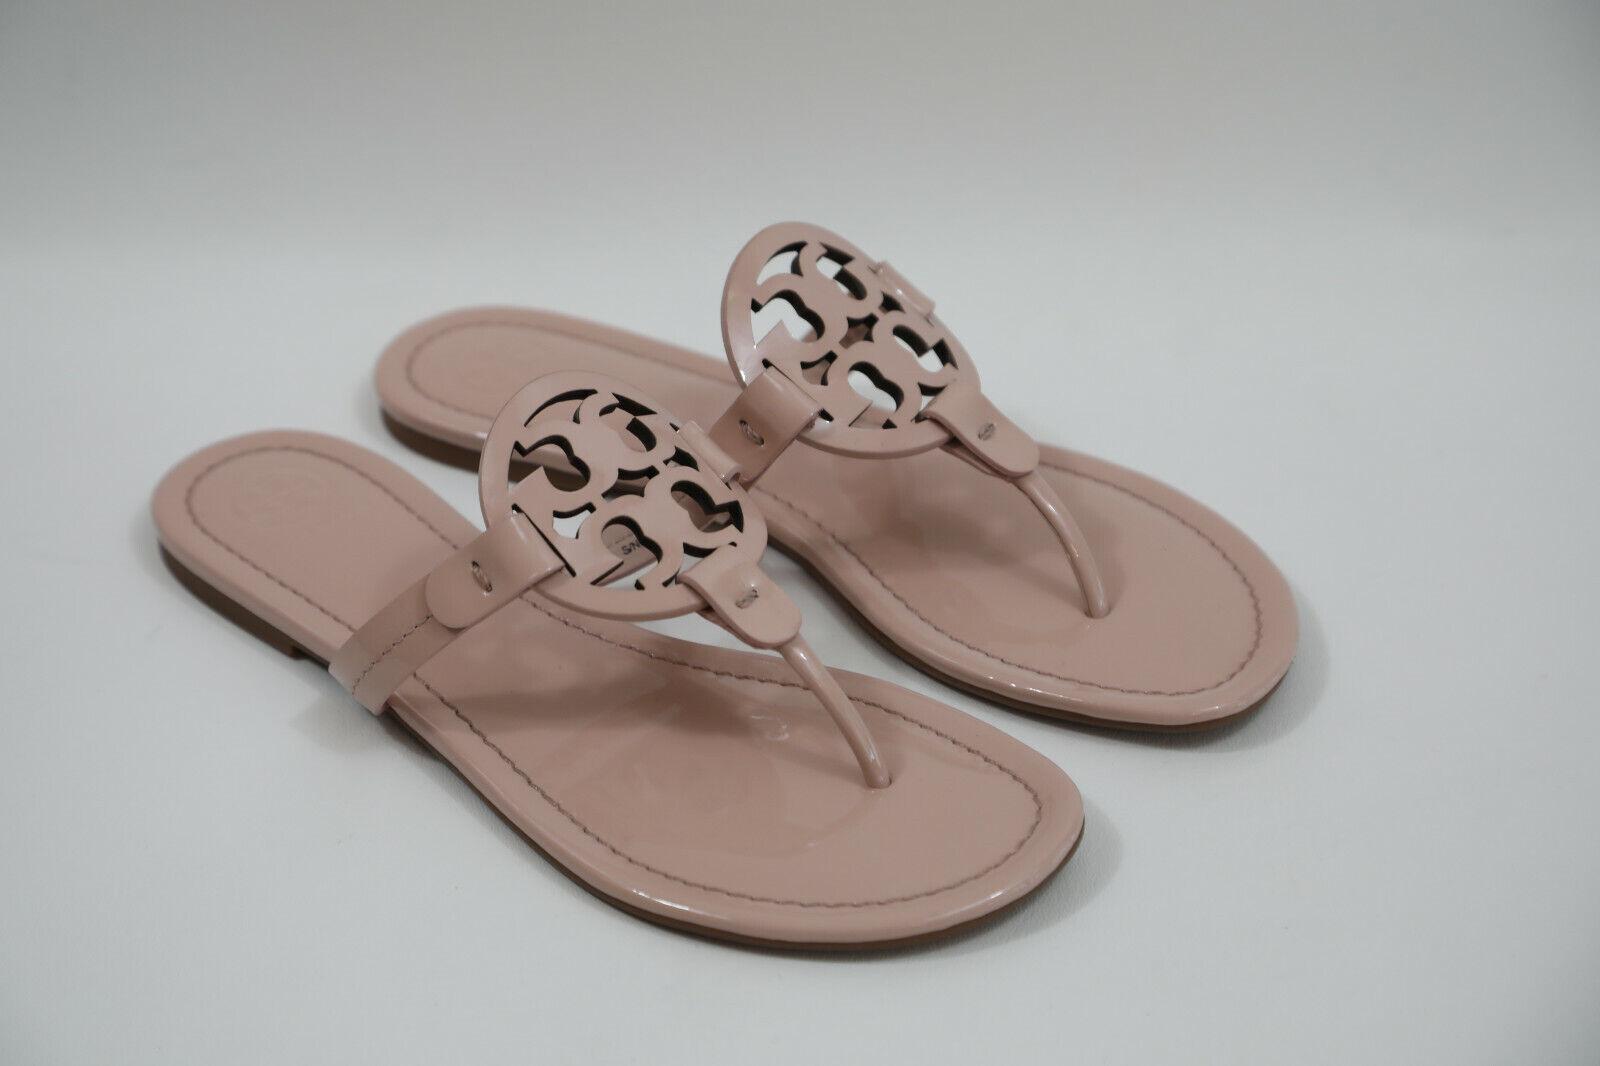 10 10 10 Tory Burch 'Miller' Flip Flop Sandals Size 8.5 M   198 retail 38ebb6